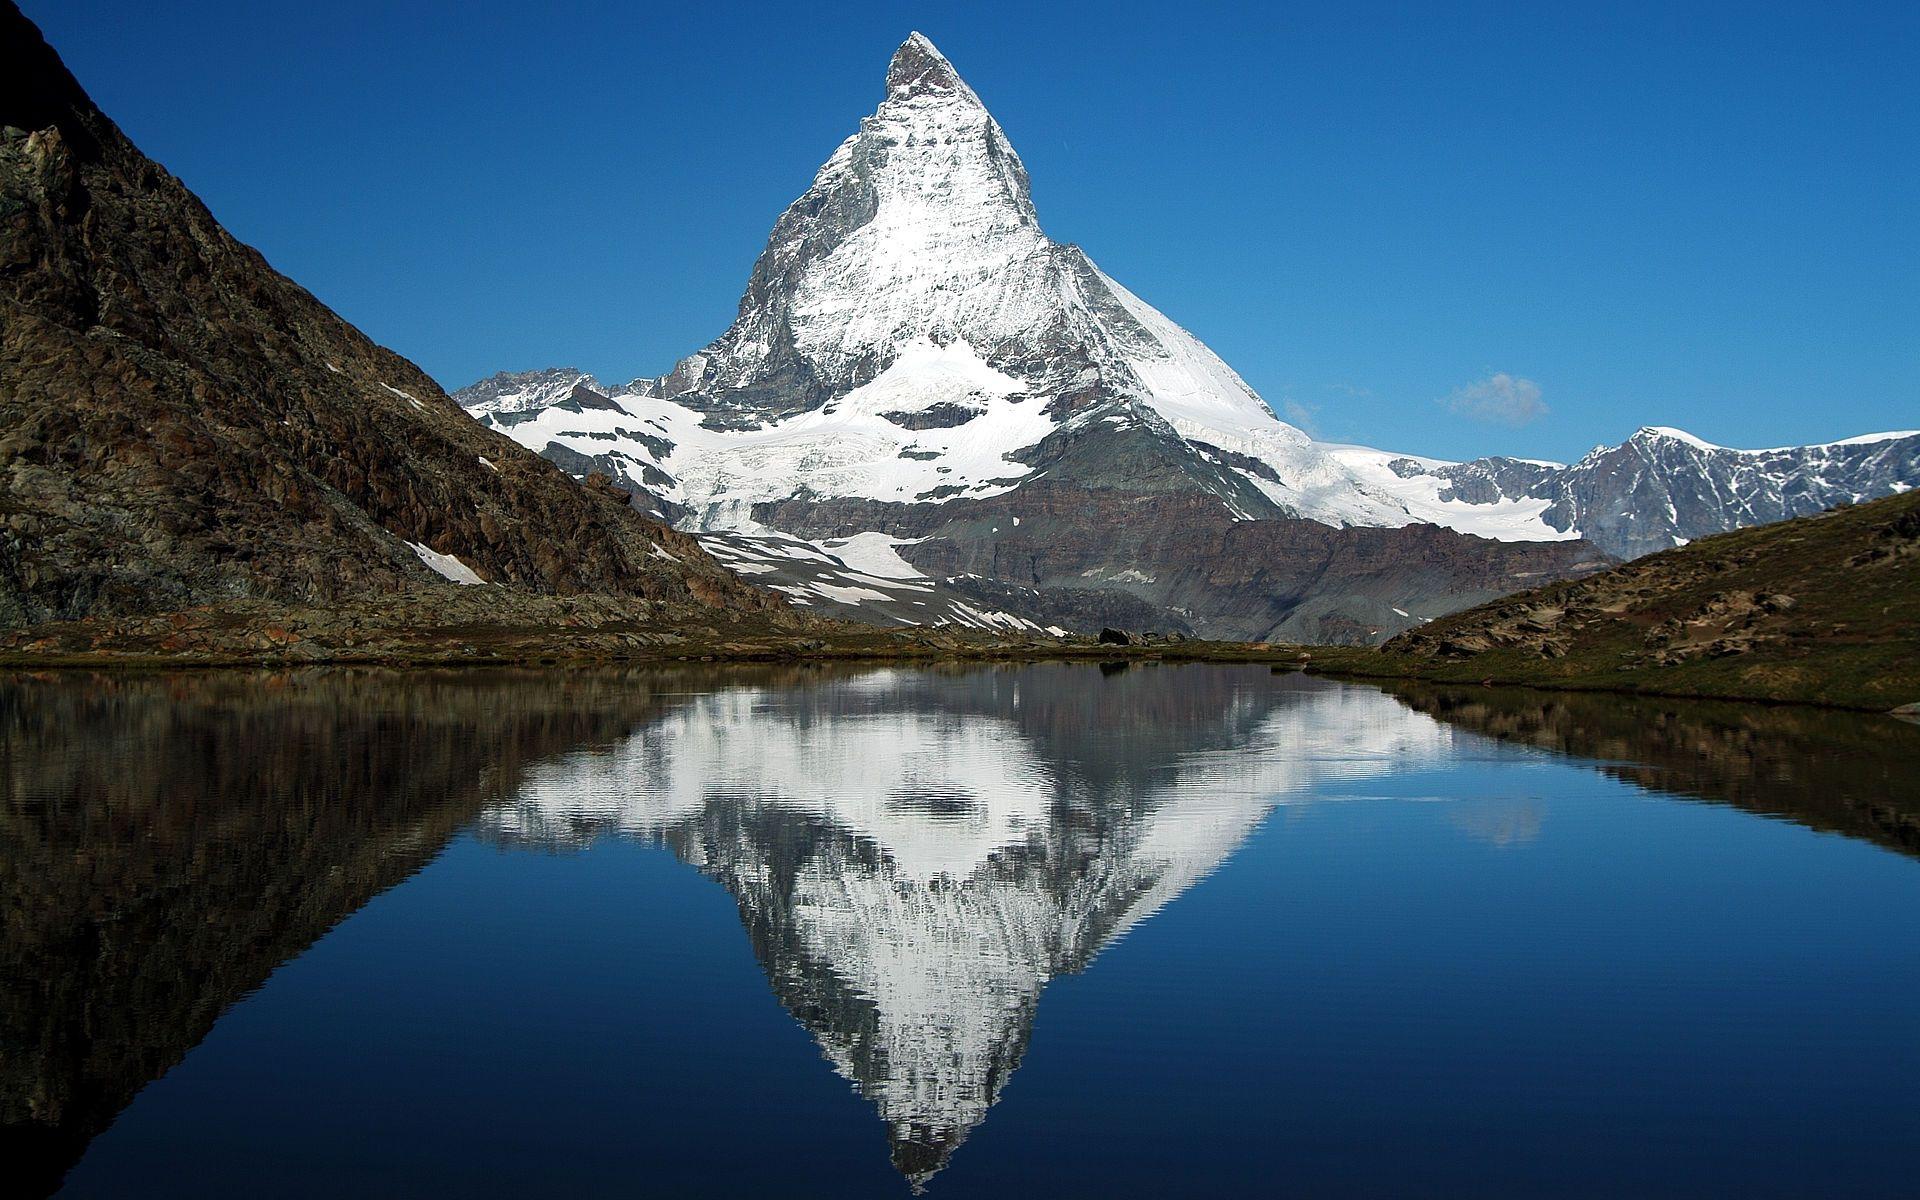 Matterhorn Glacier Paradise Mountains Alps Kilimanjaro Climb